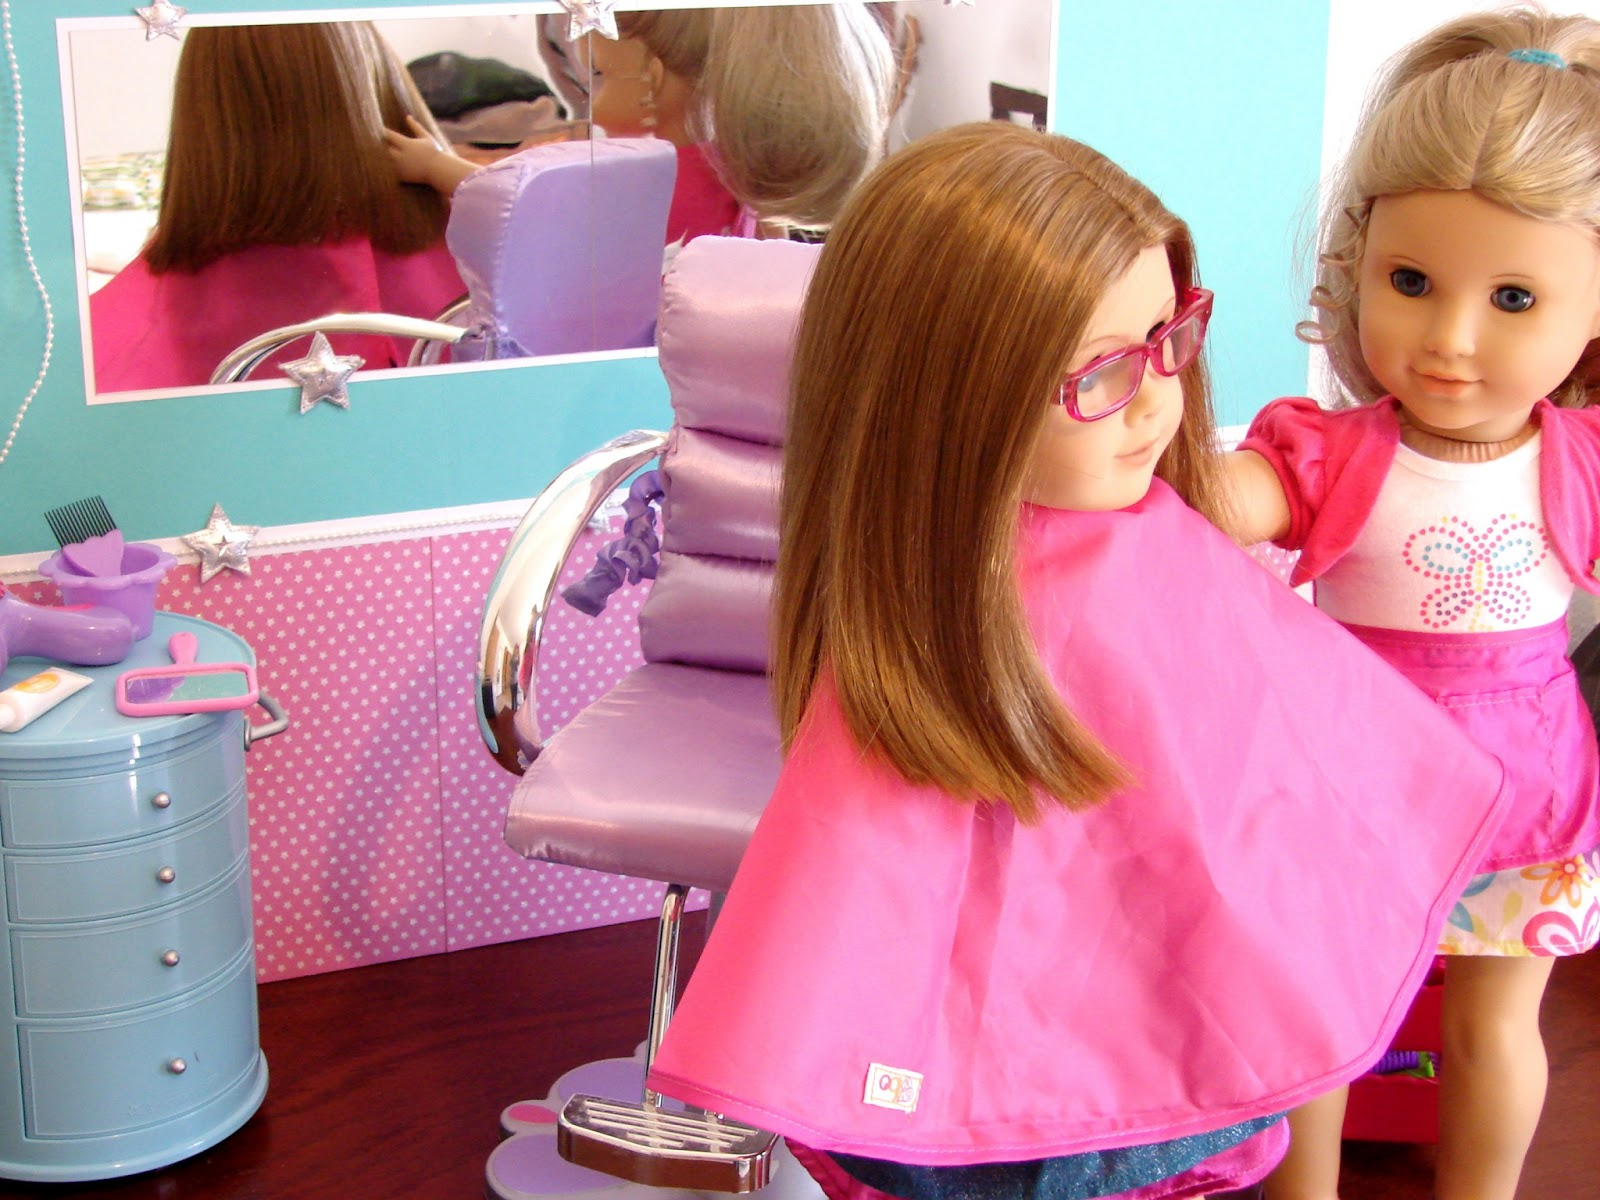 Doll Salon Chair Baxton Studio Chairs American Girl Play Crafting Make A